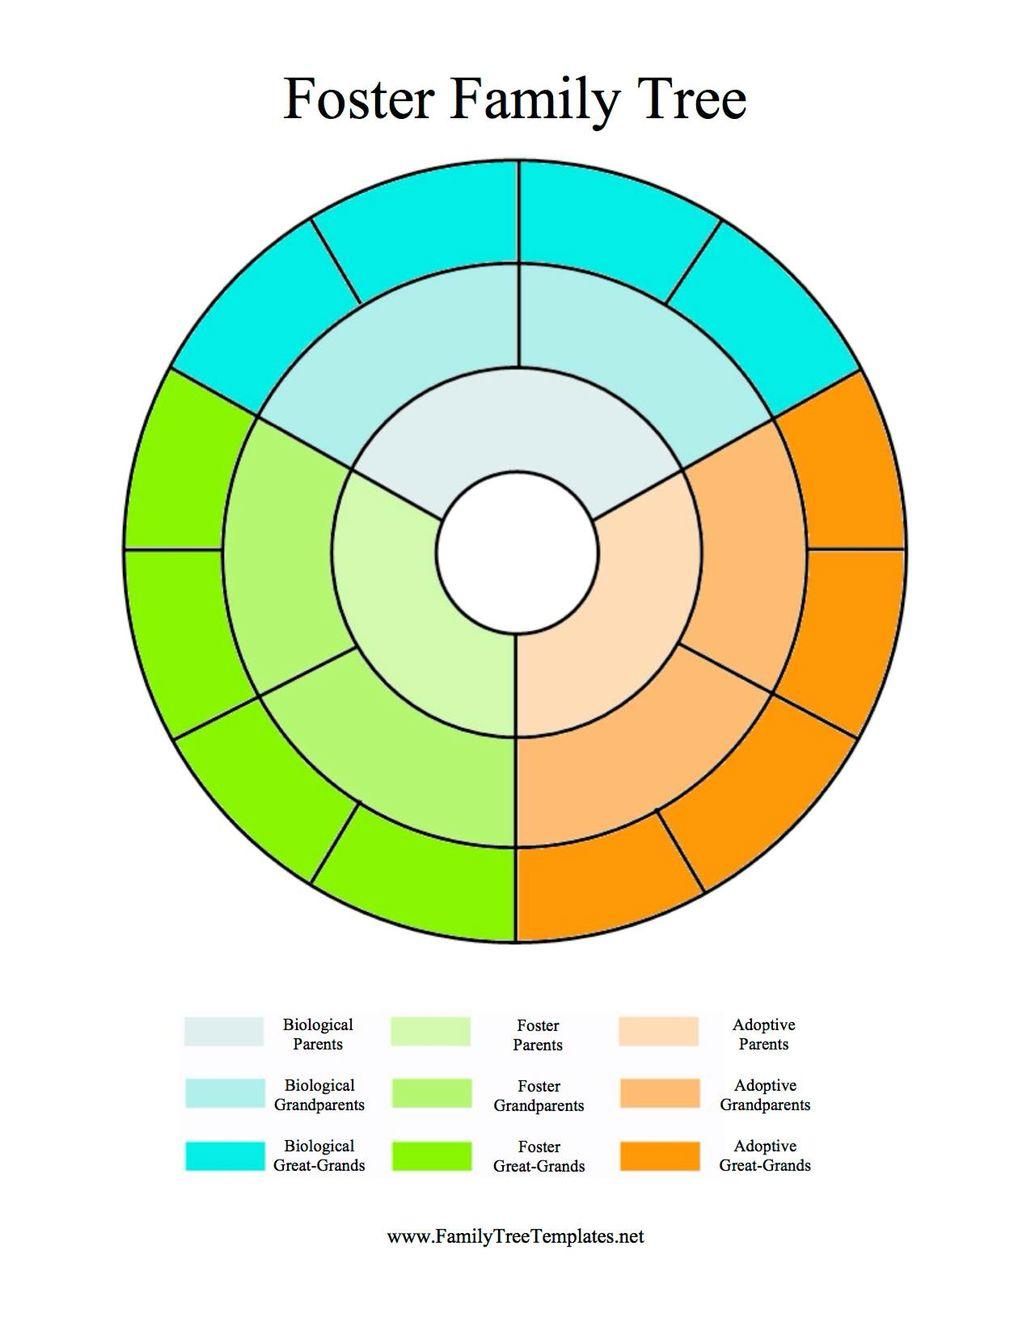 Foster Adoptive Family Tree Circle